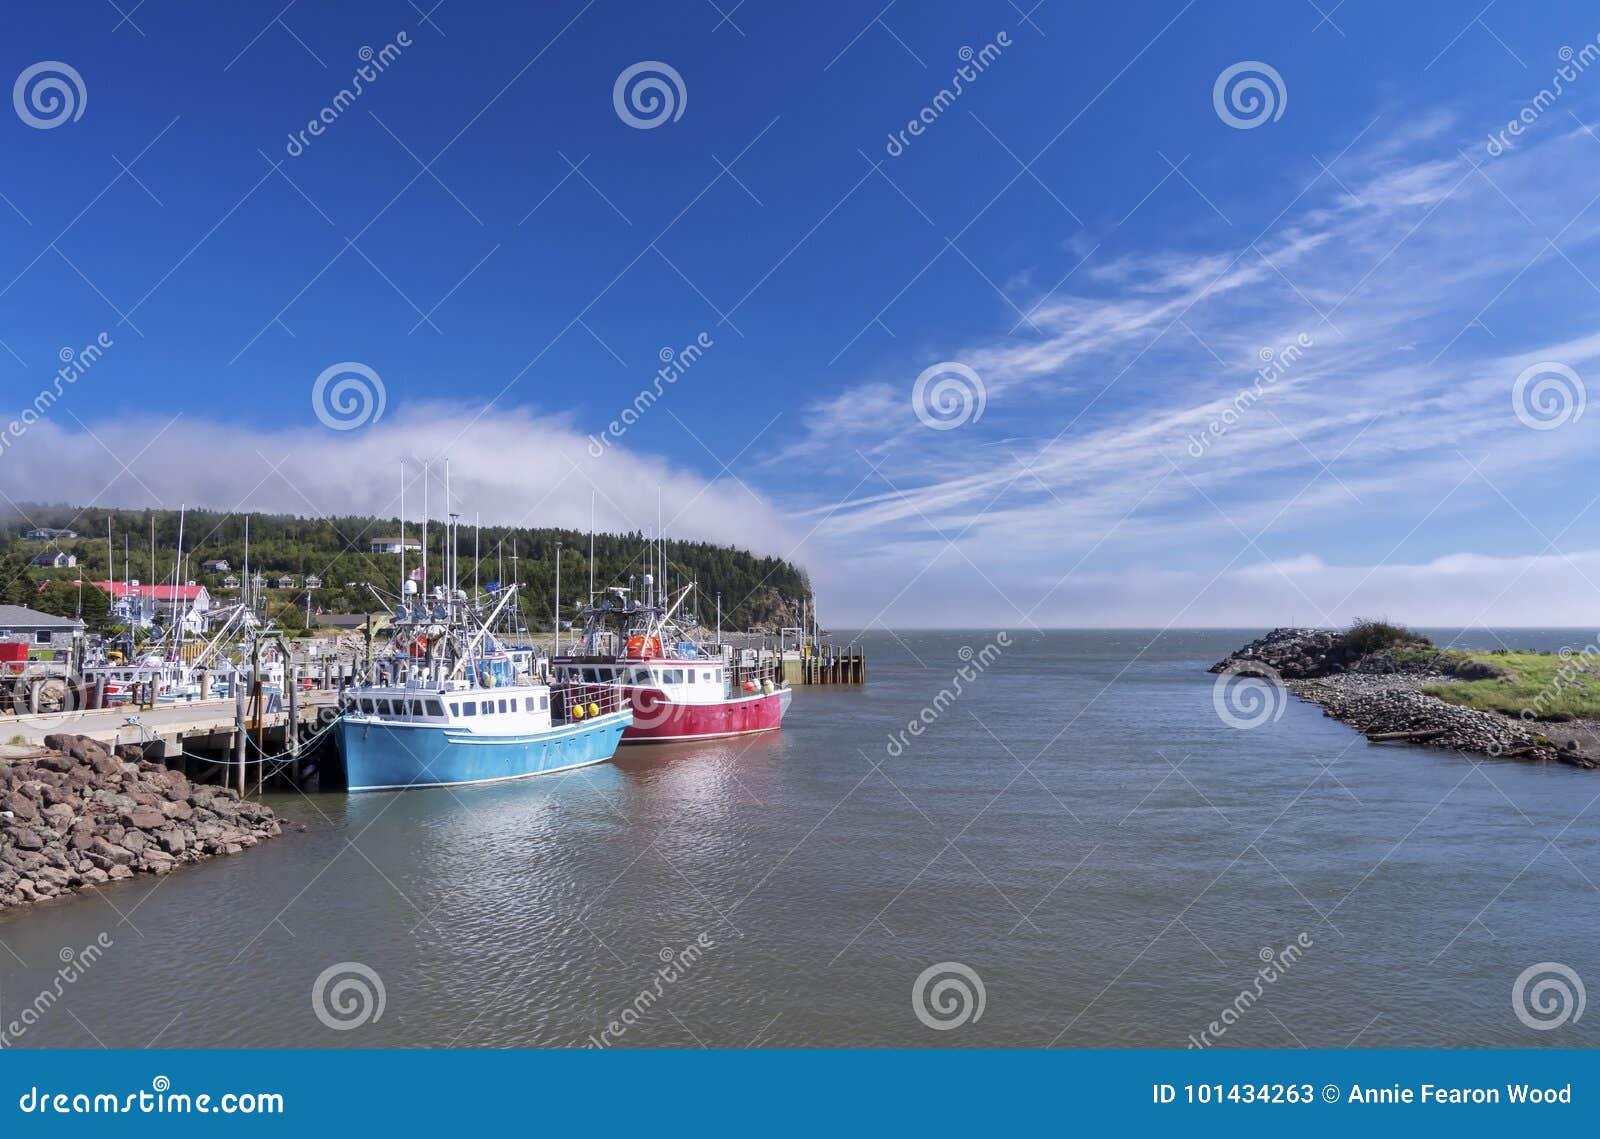 Bay Of Fundy, New Brunswick, Canada Stock Image - Image of